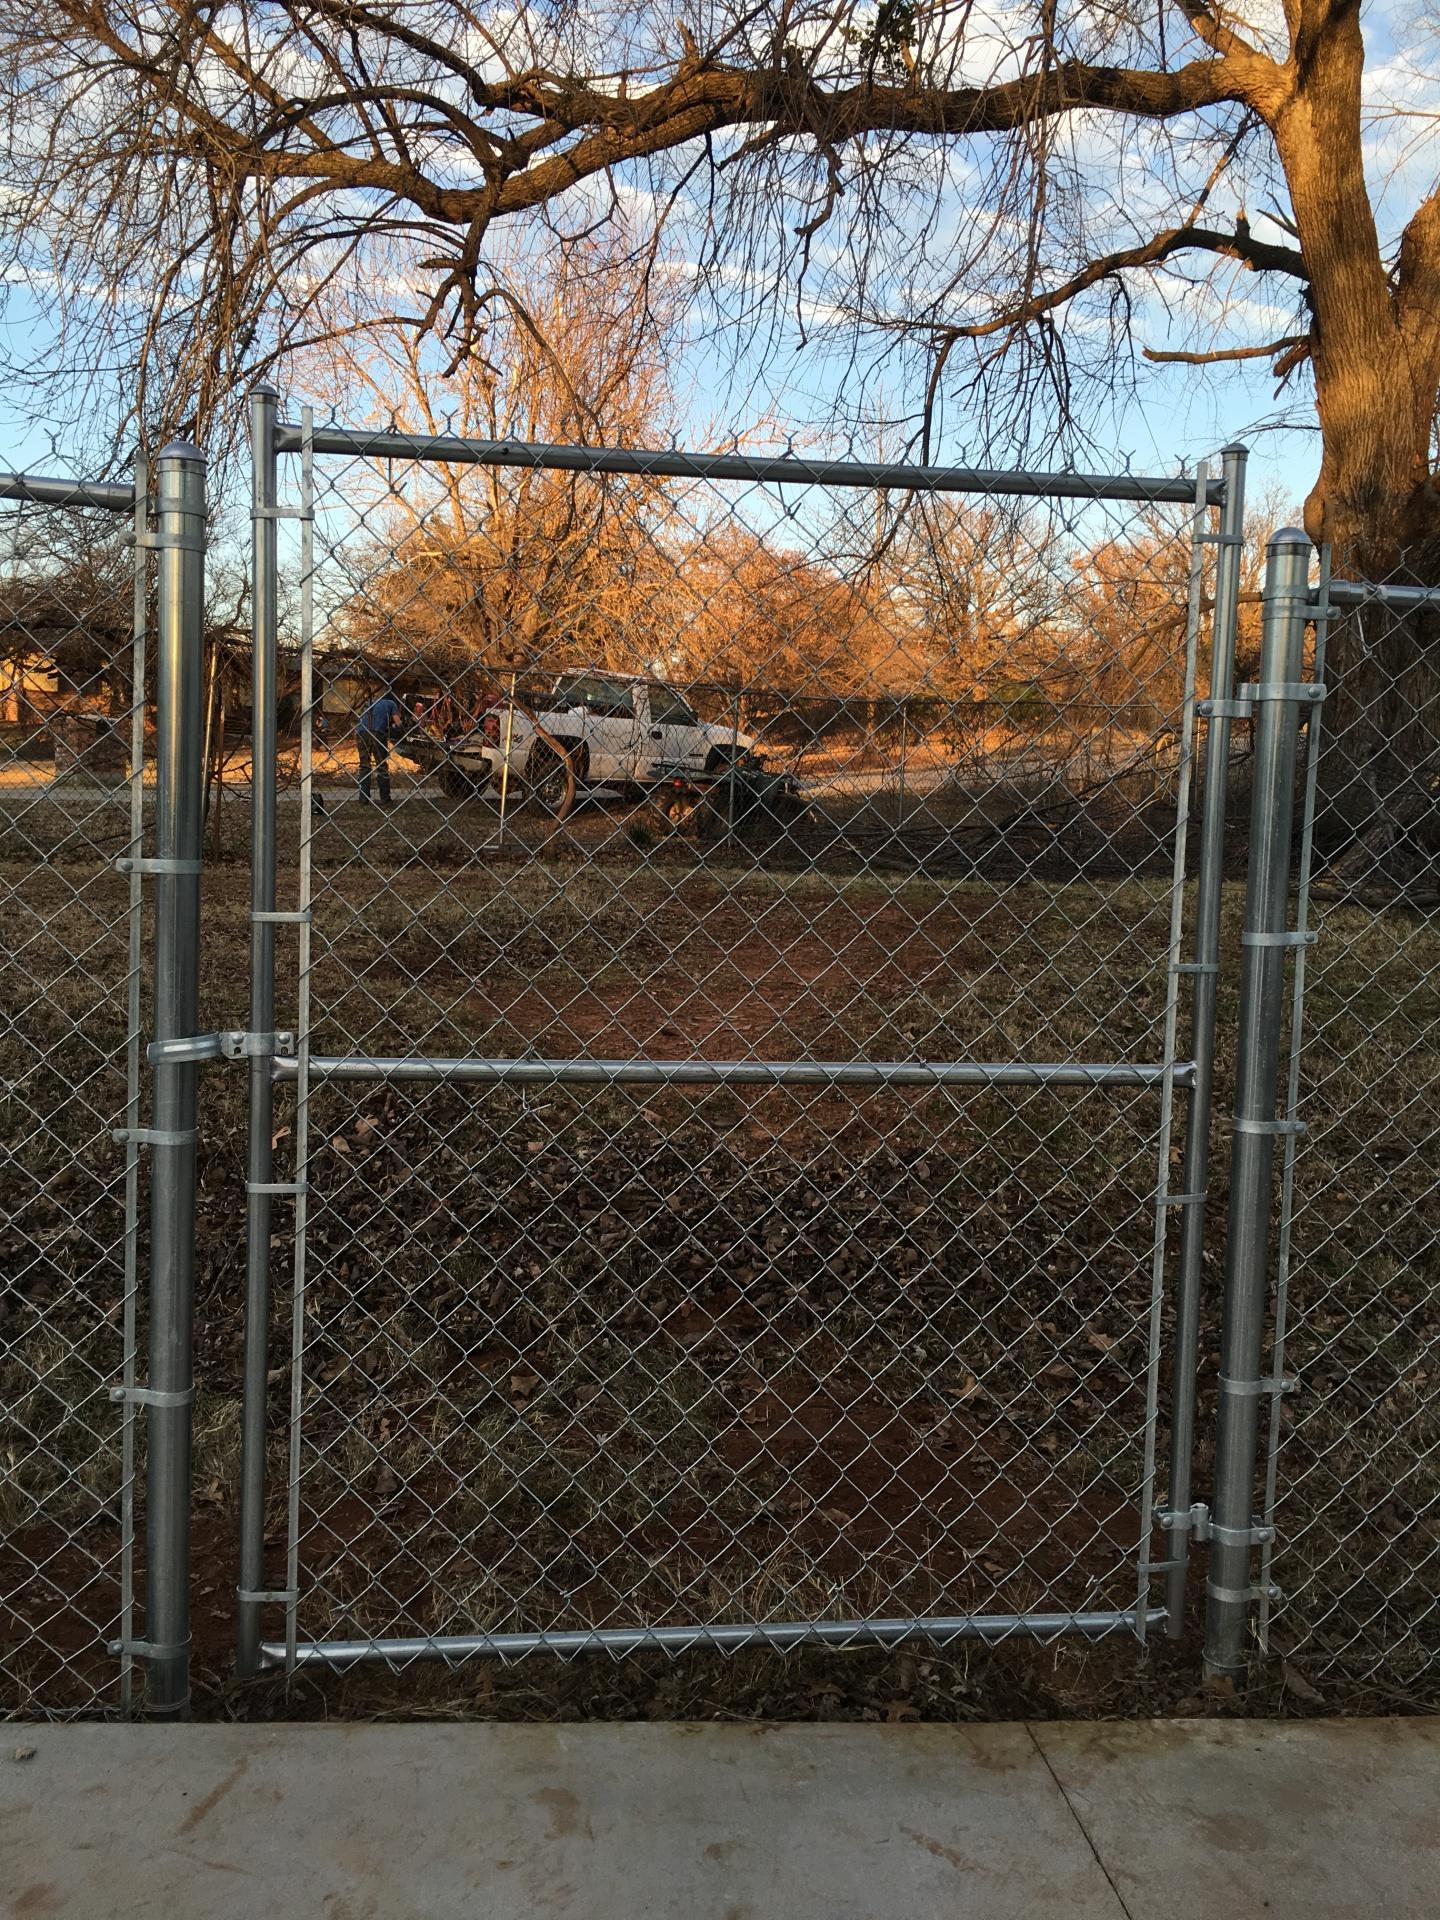 5 ft Galvanized Chain Link Walk Gate Security Play Yard Dog Kids Edmond Oklahoma Fence Gate Company